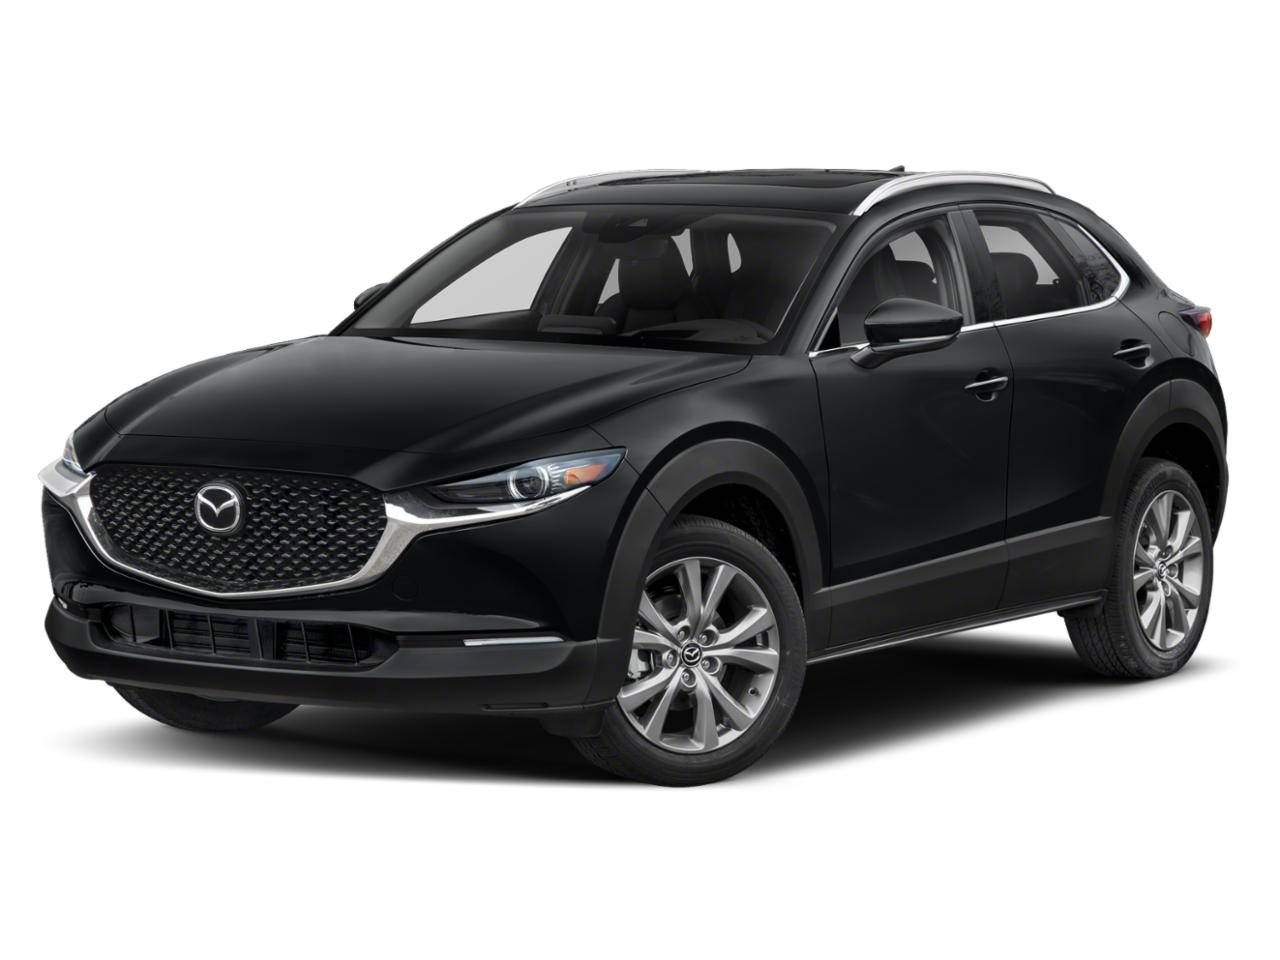 2021 Mazda CX-30 Vehicle Photo in Rockville, MD 20852